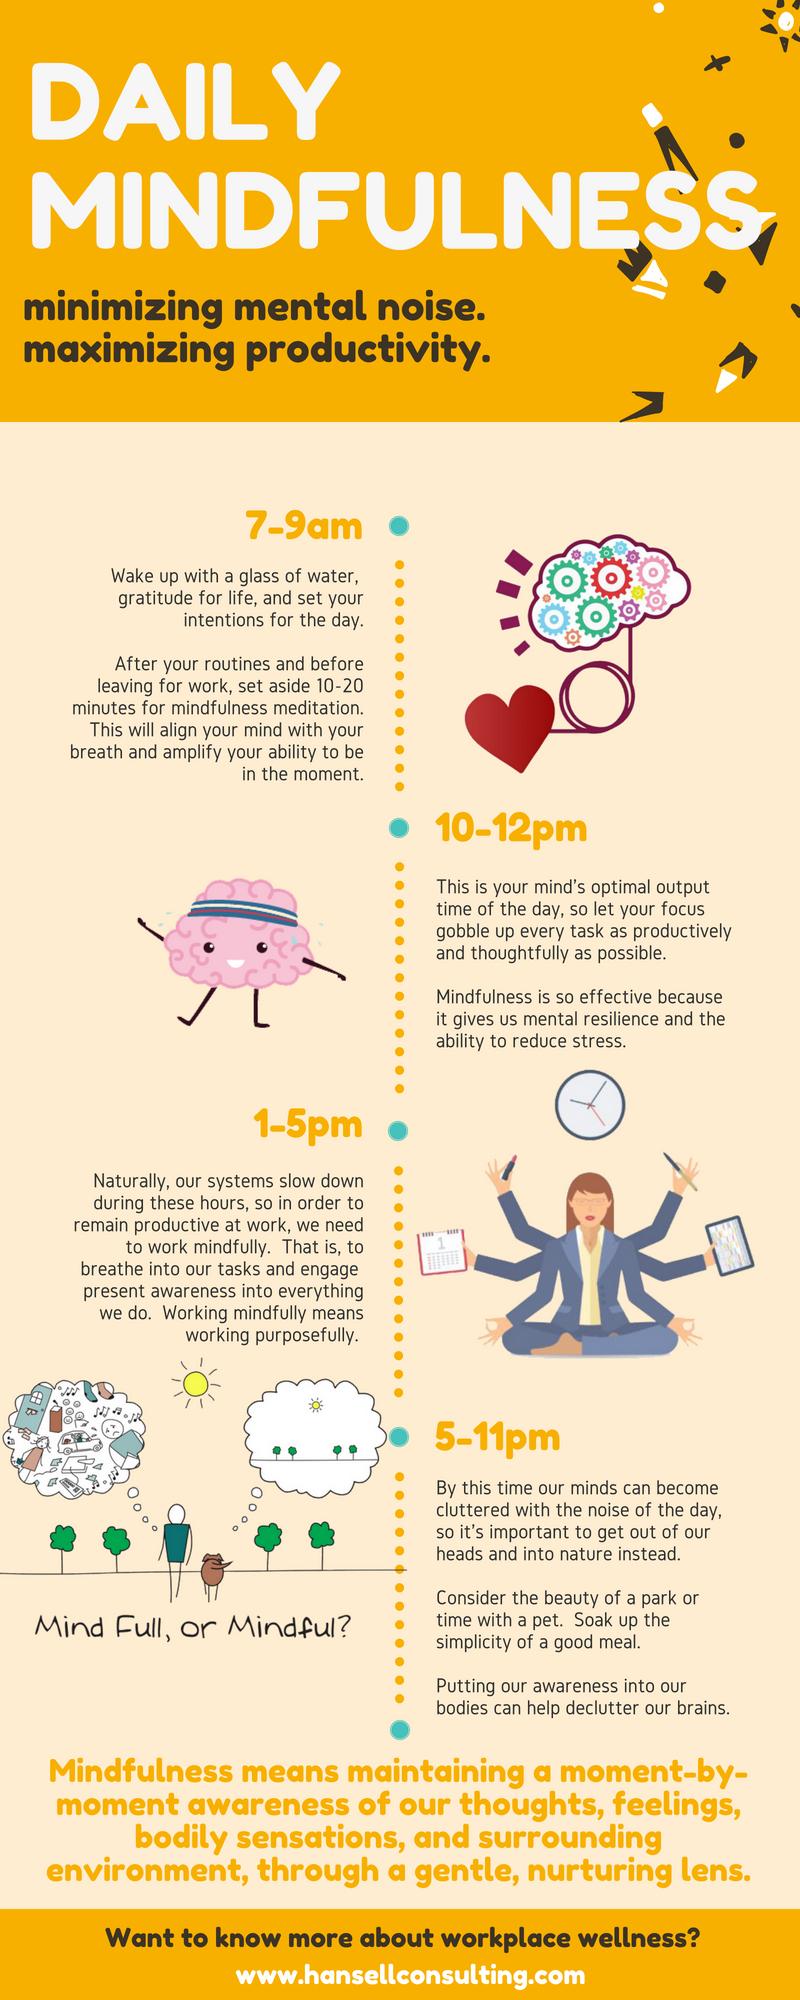 Daily mindfulness.jpg